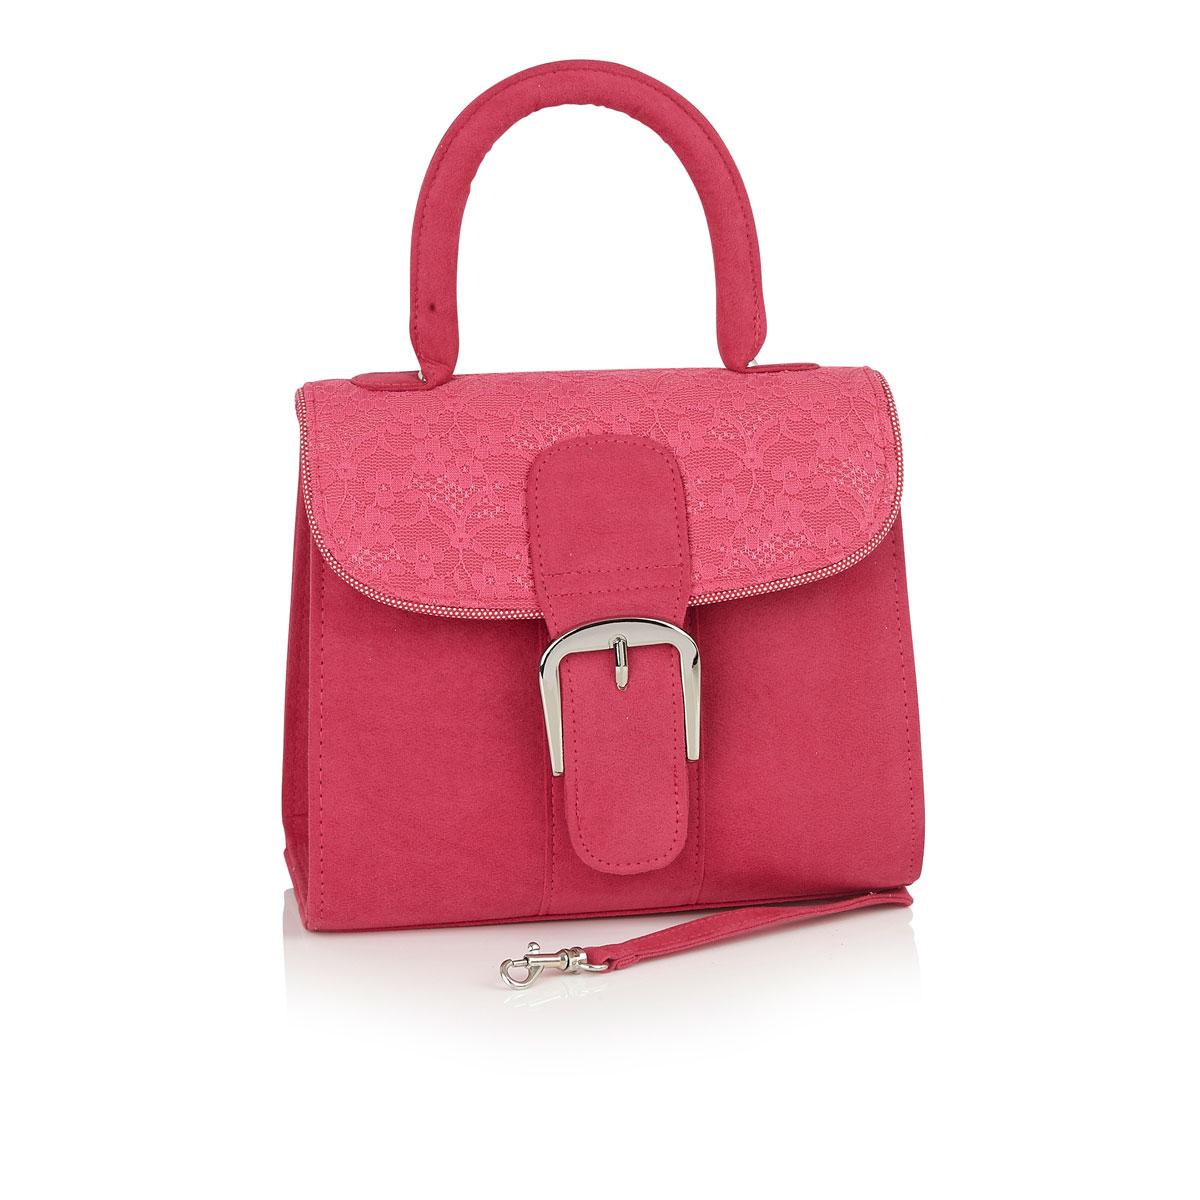 b5ee1dd621 Ruby Shoo Matching Handbag - Fuchsia - 50183 62 RIVA VERONICA